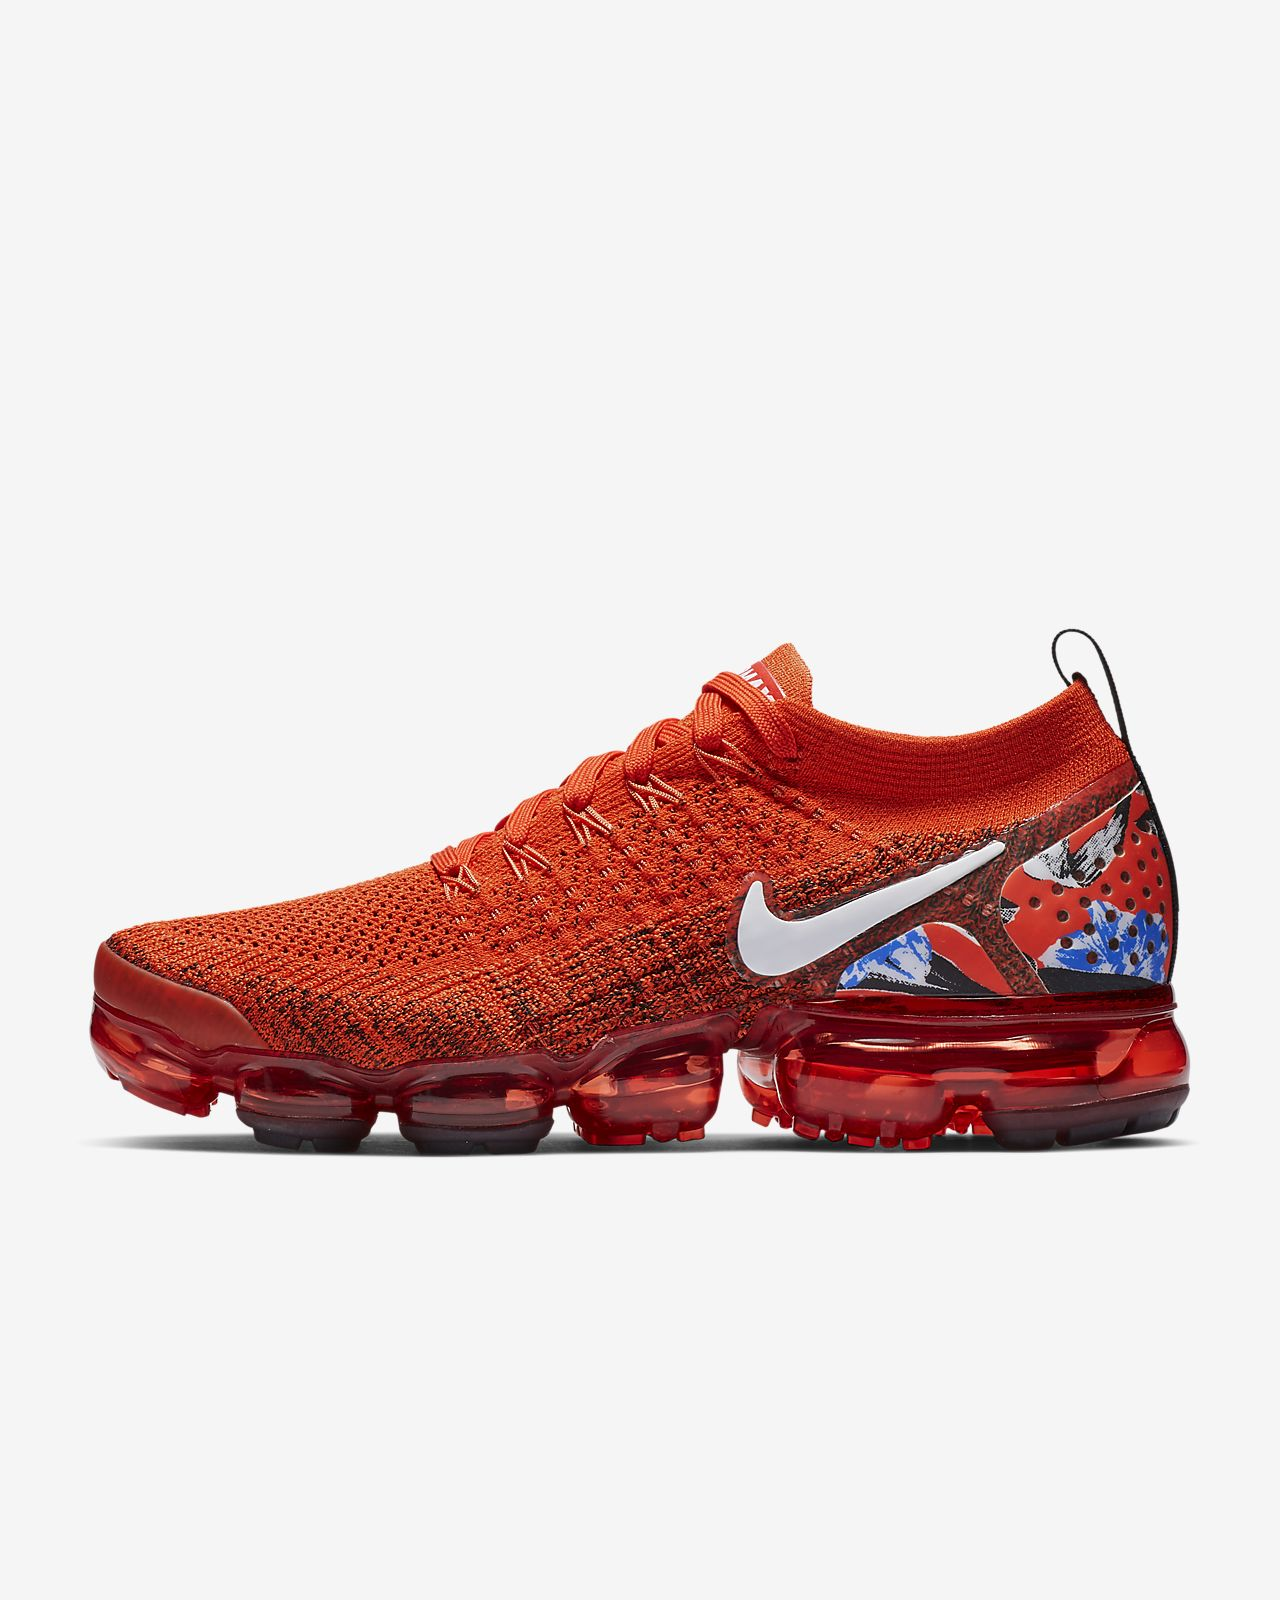 new product 8171b d73d4 ... Nike Air VaporMax Flyknit 2 Women s Shoe